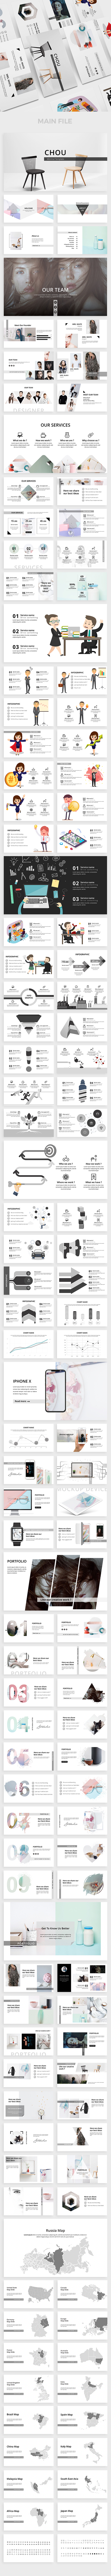 Chou Mininmal Keynote Template - Creative Keynote Templates